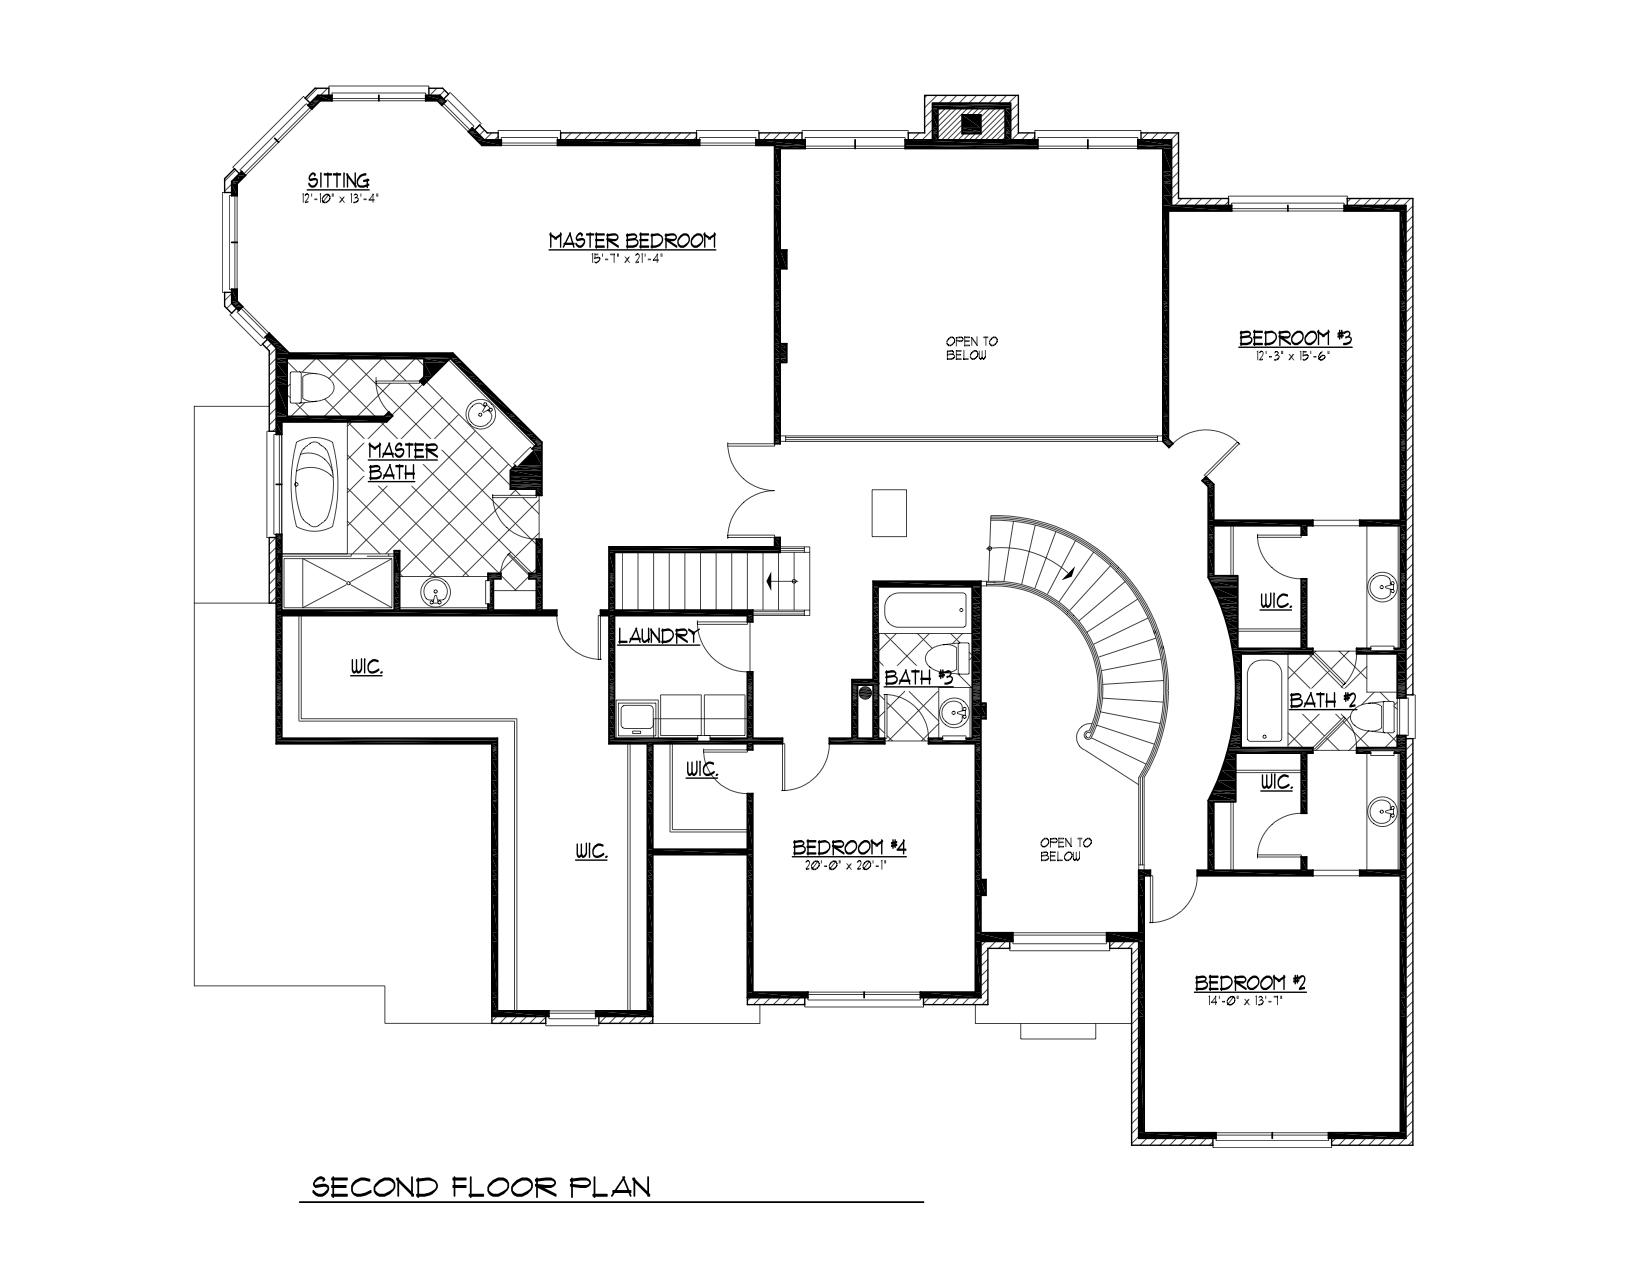 Wilmington_Second_Floor_Plan_Optional JPEG.jpg